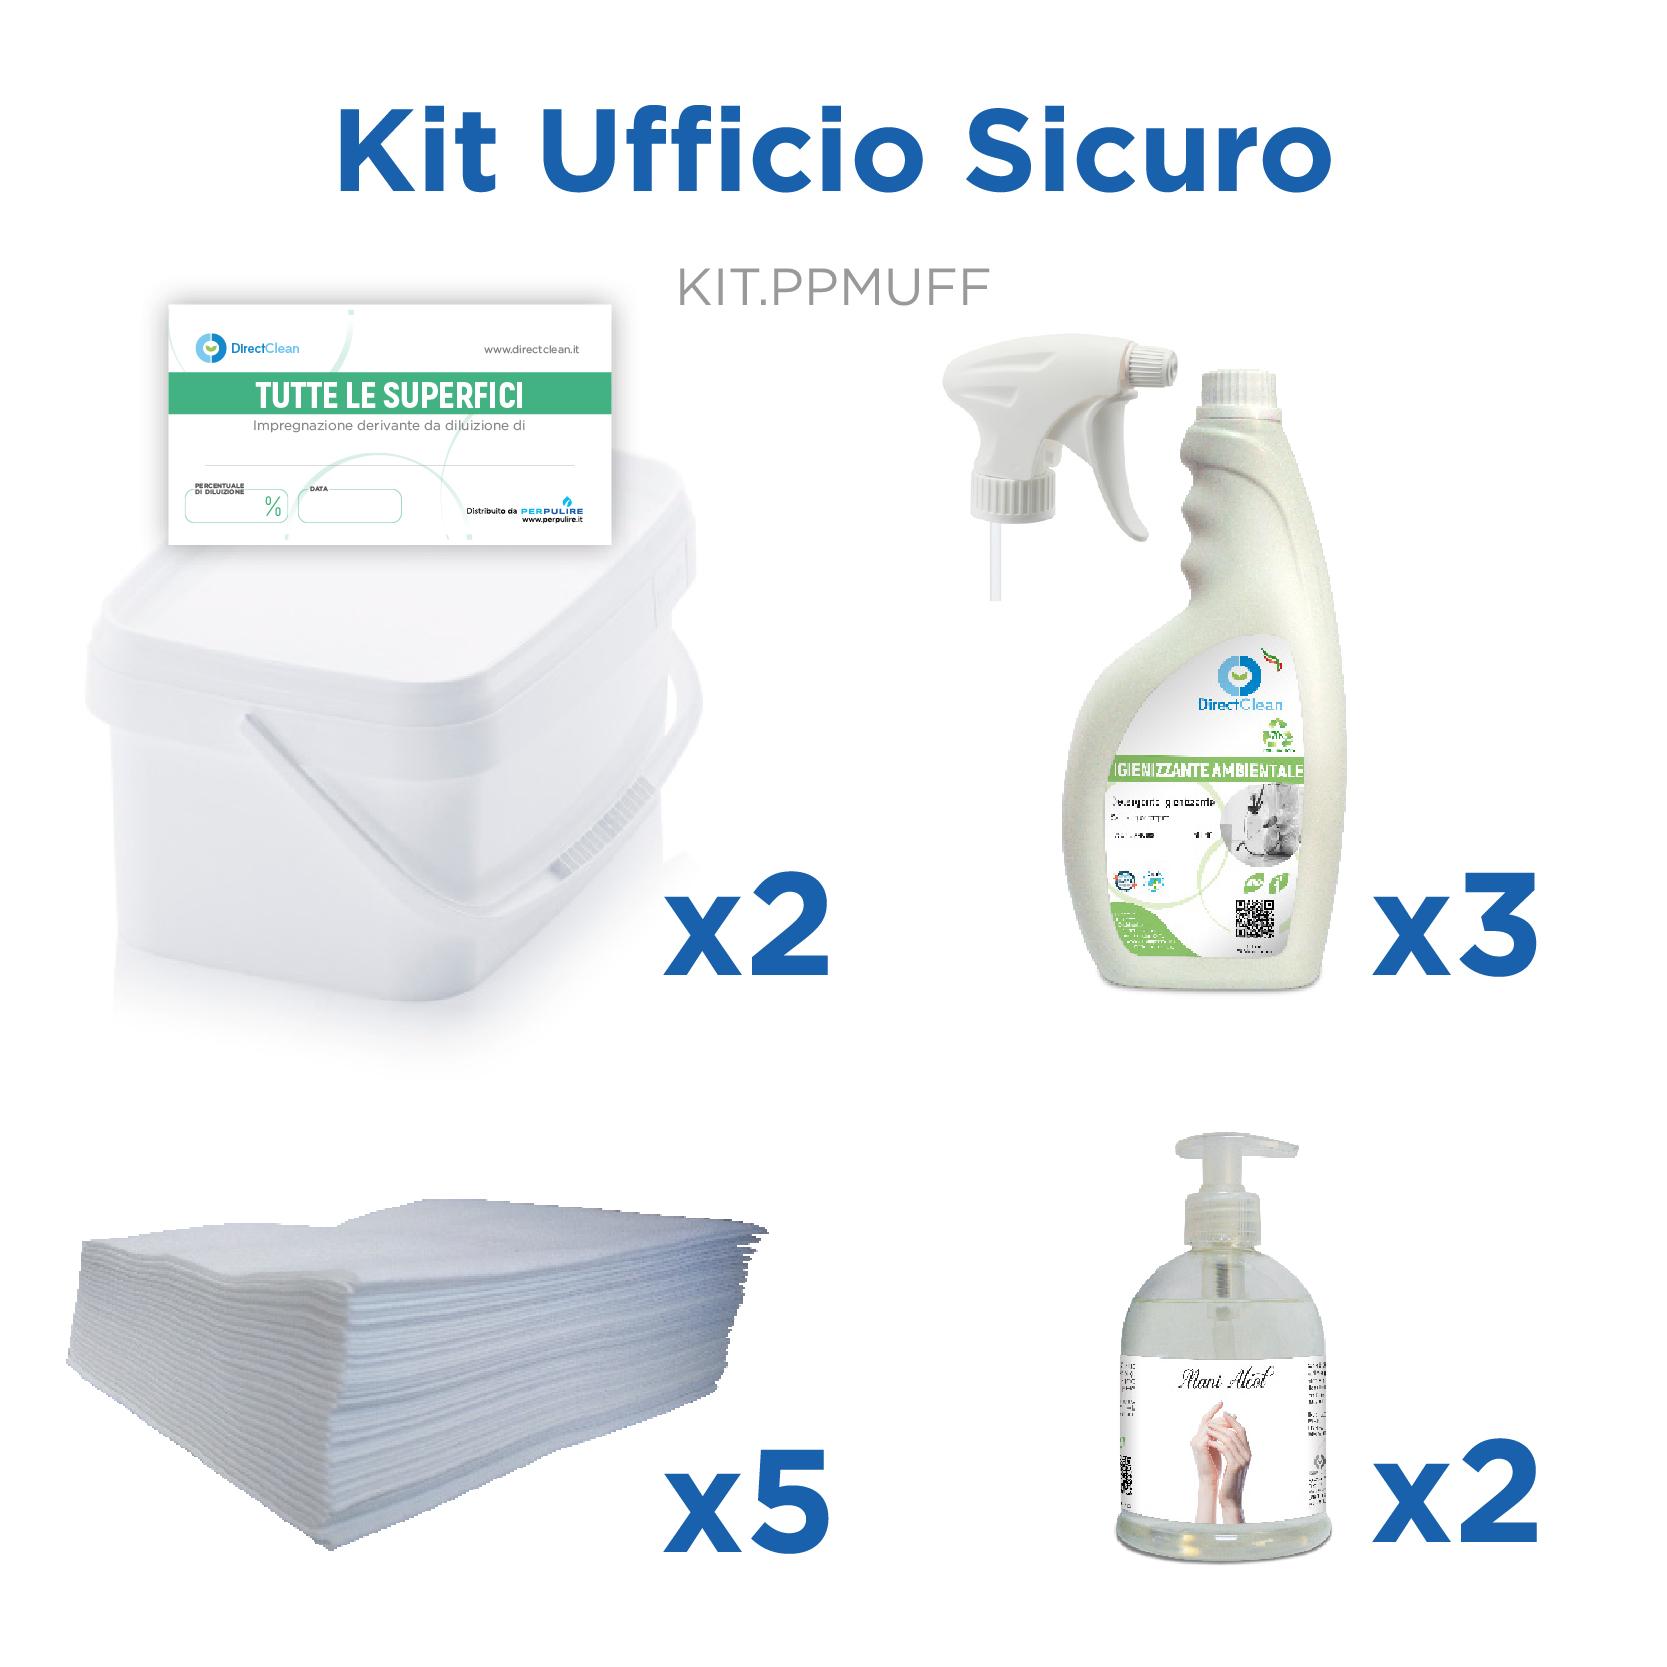 KIT UFFICIO SICURO - LINEA BENTORNATO